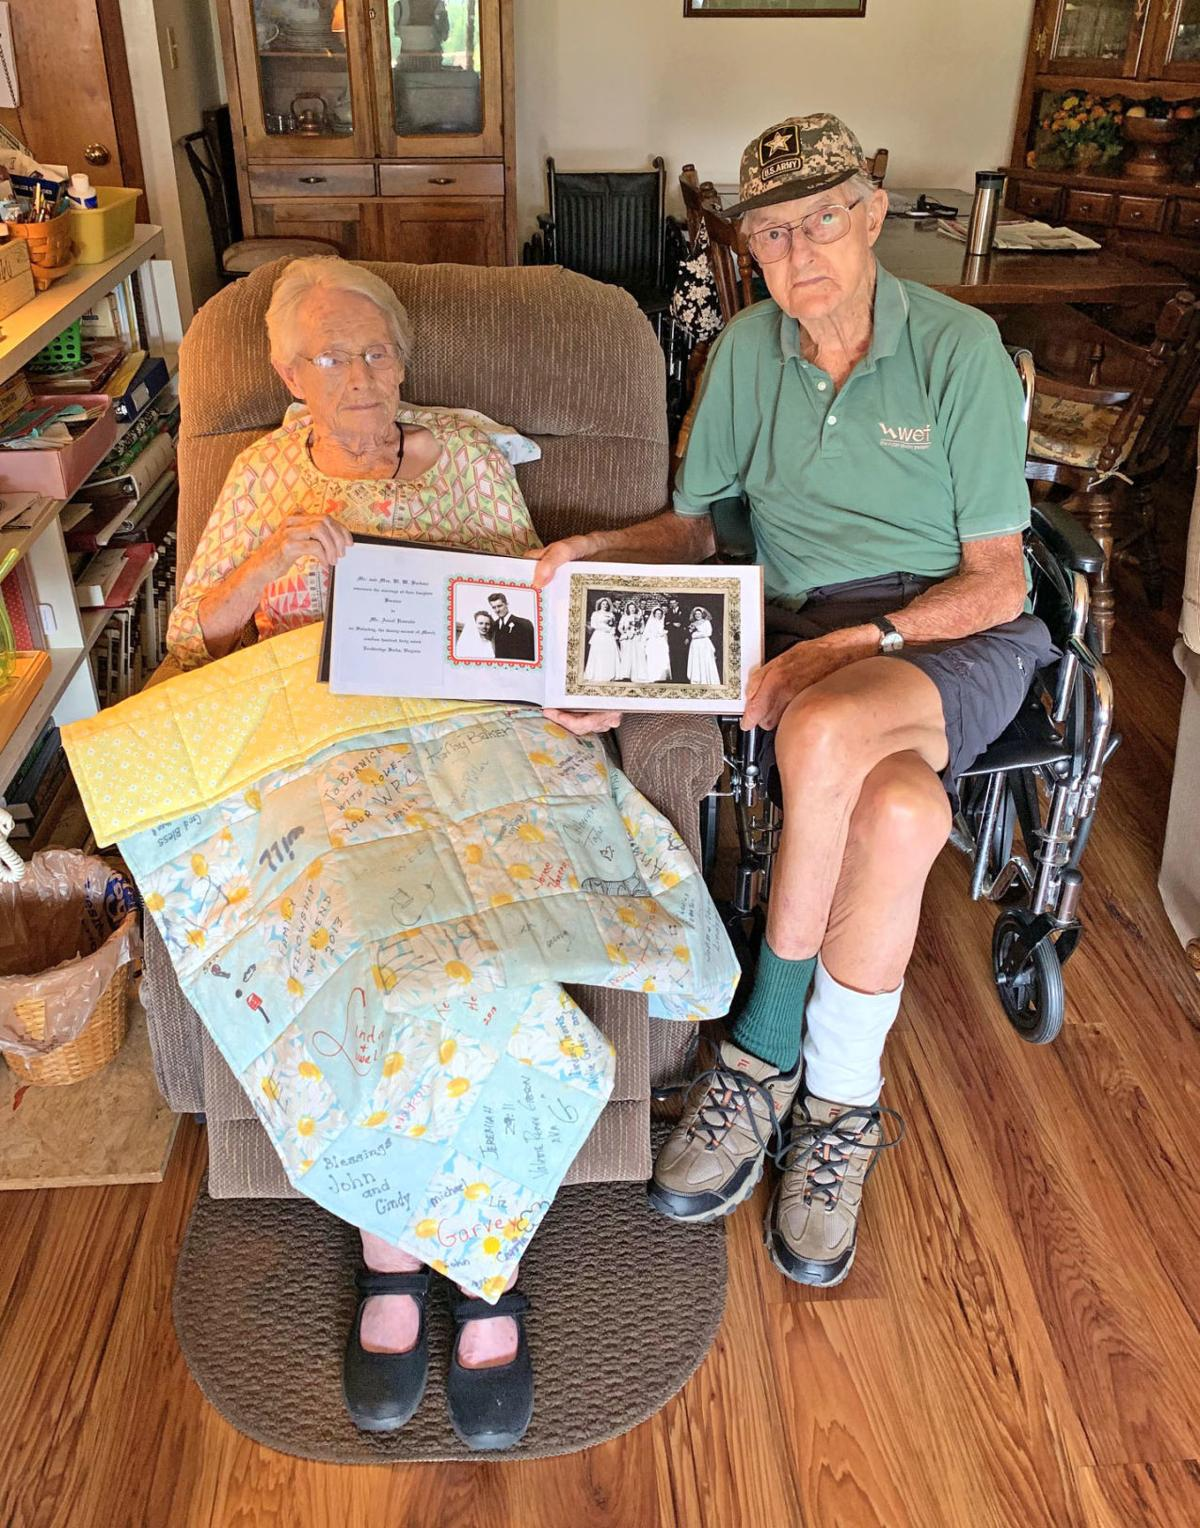 Previous Ladd teacher turns 100